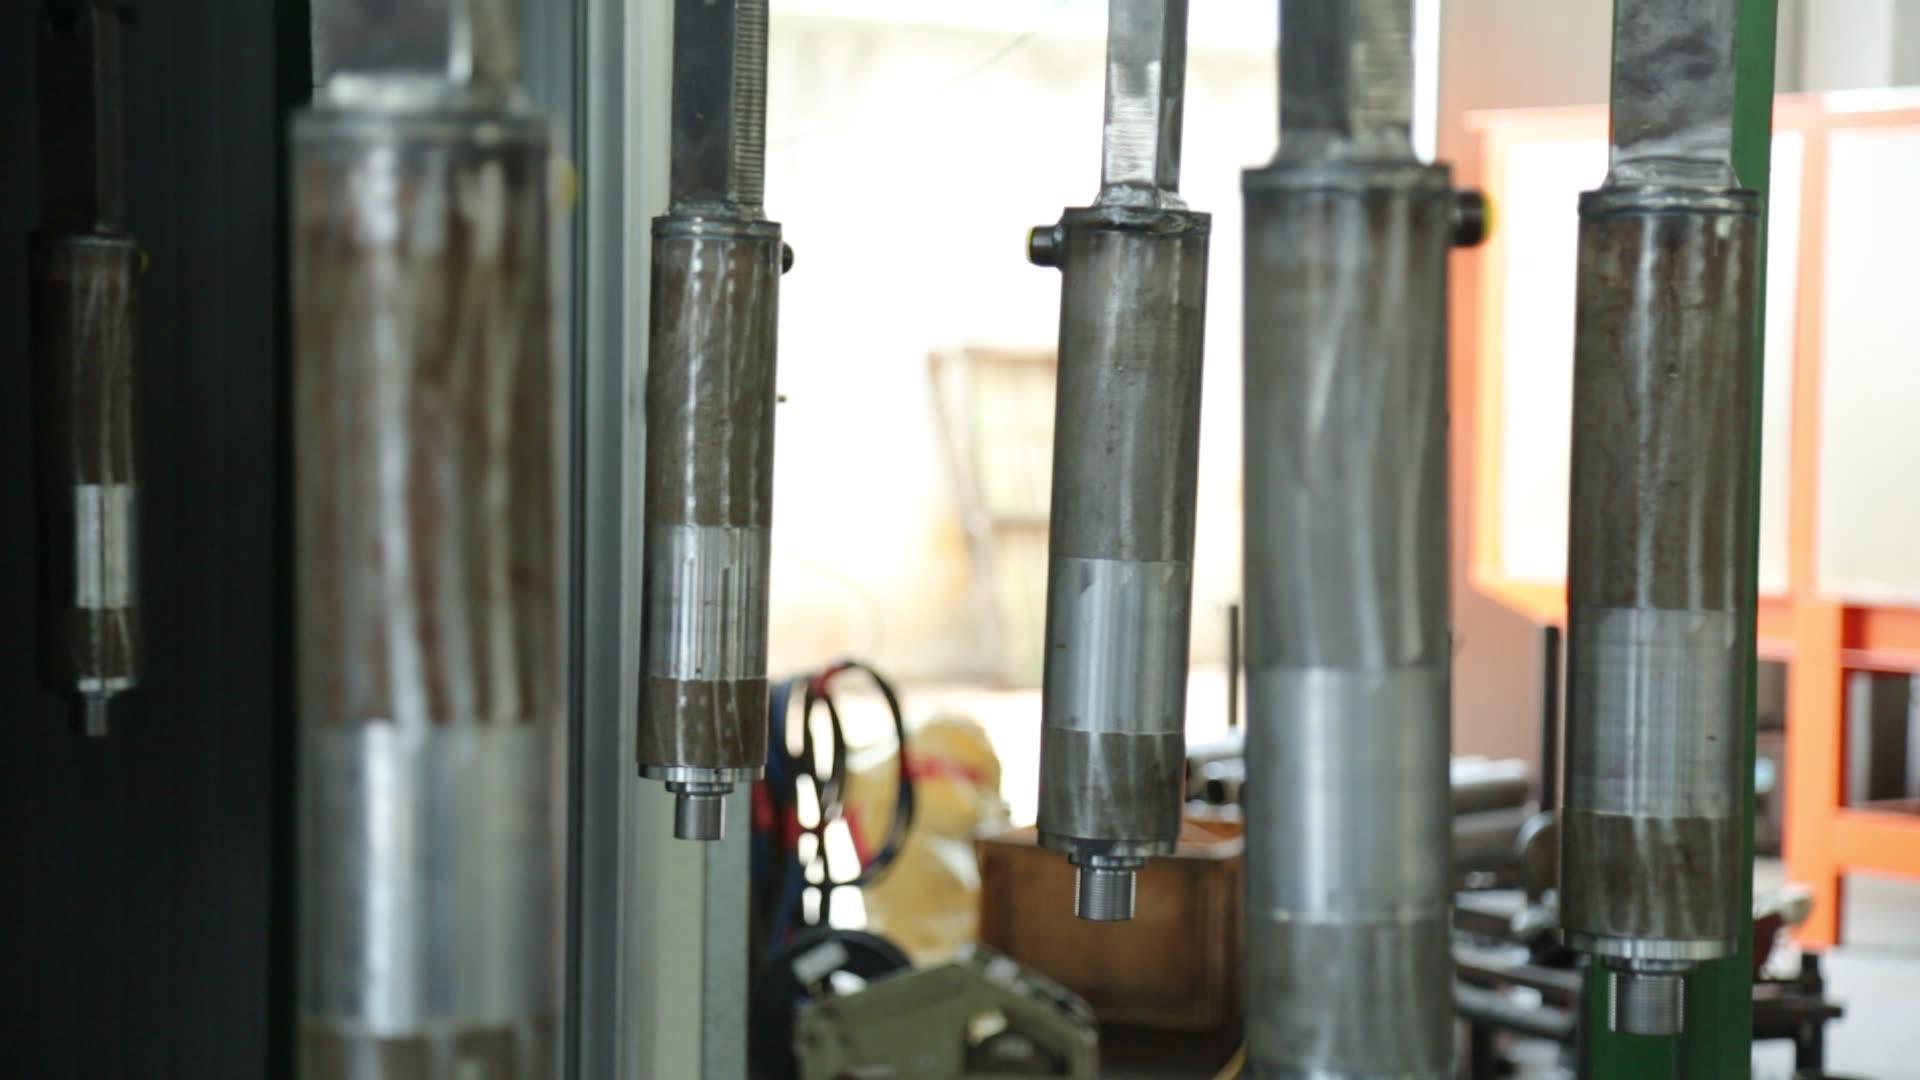 Pneumatic/ Hydraulic cylinder chromed piston rod from China